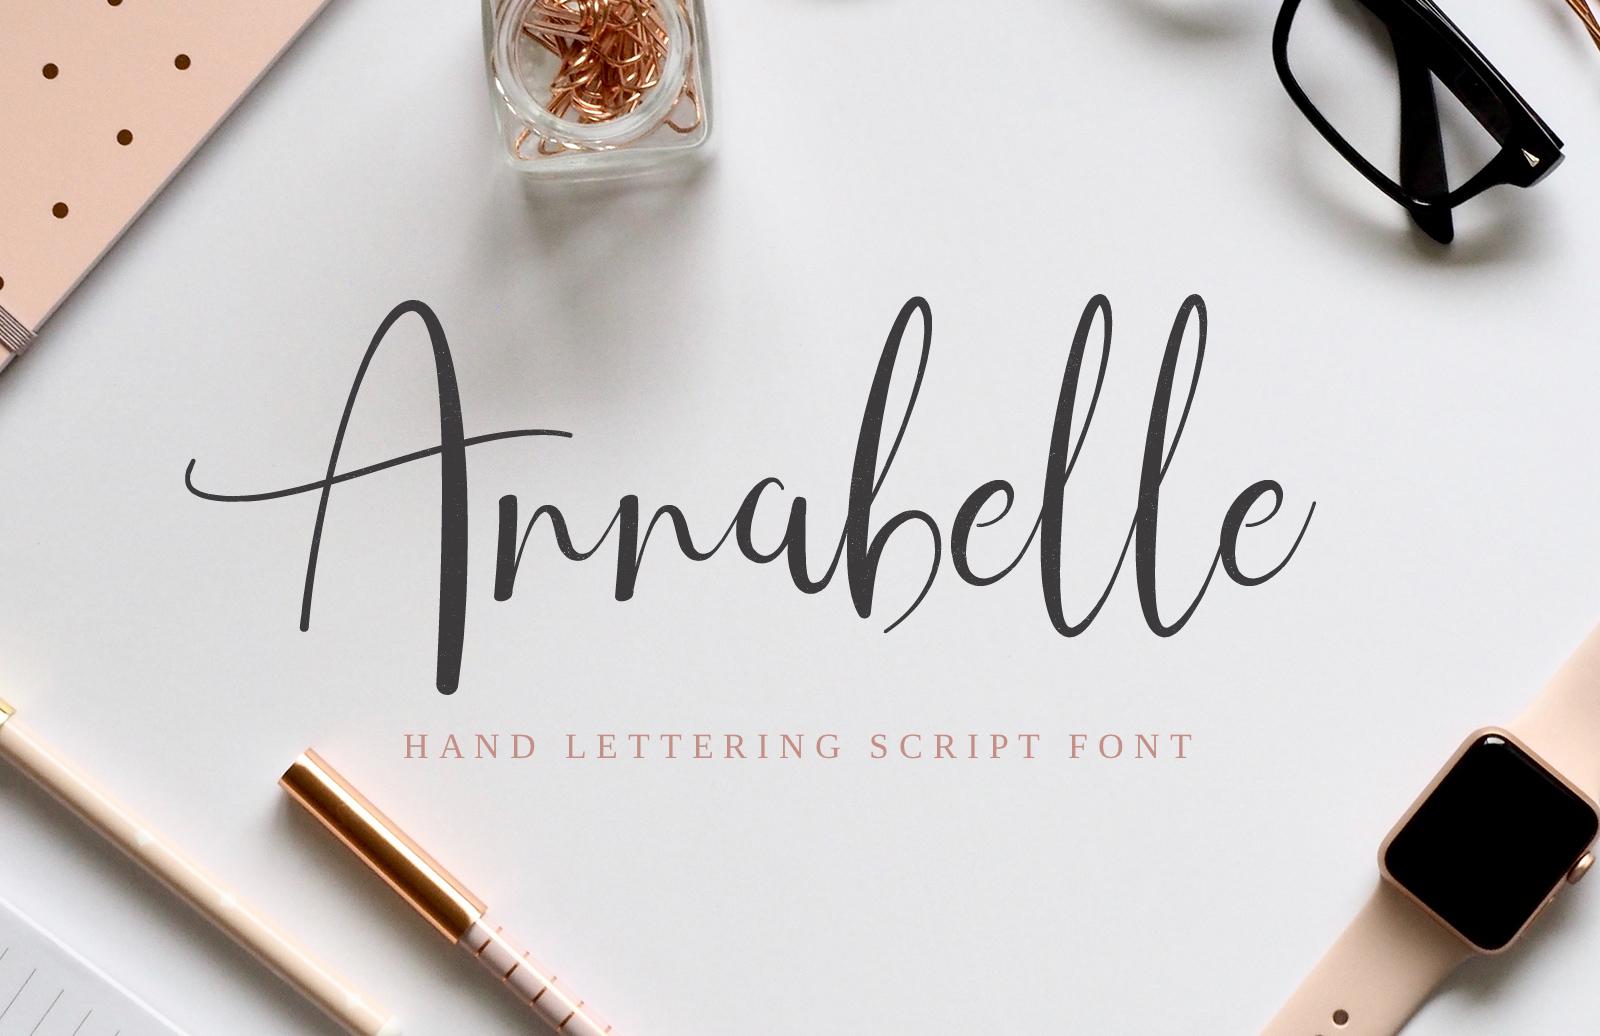 Annabelle - Hand Lettering Script Font